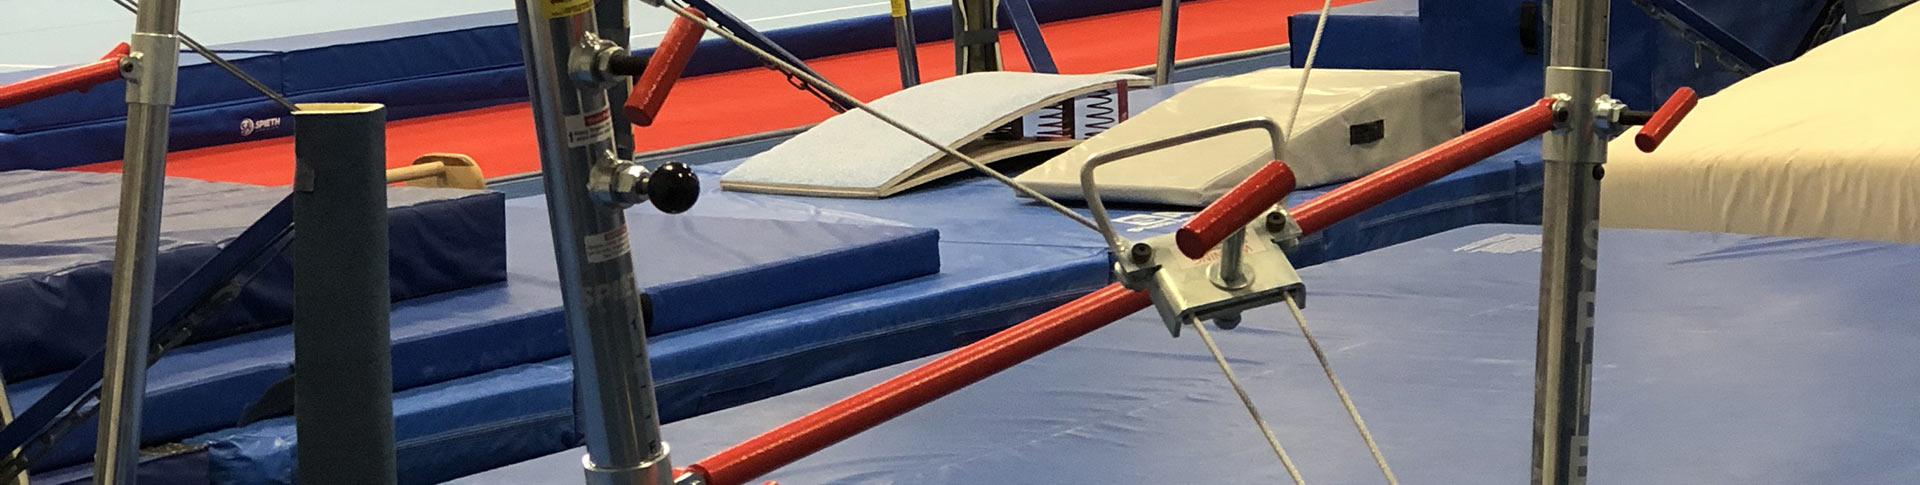 Gymnastics Equipment Inspections